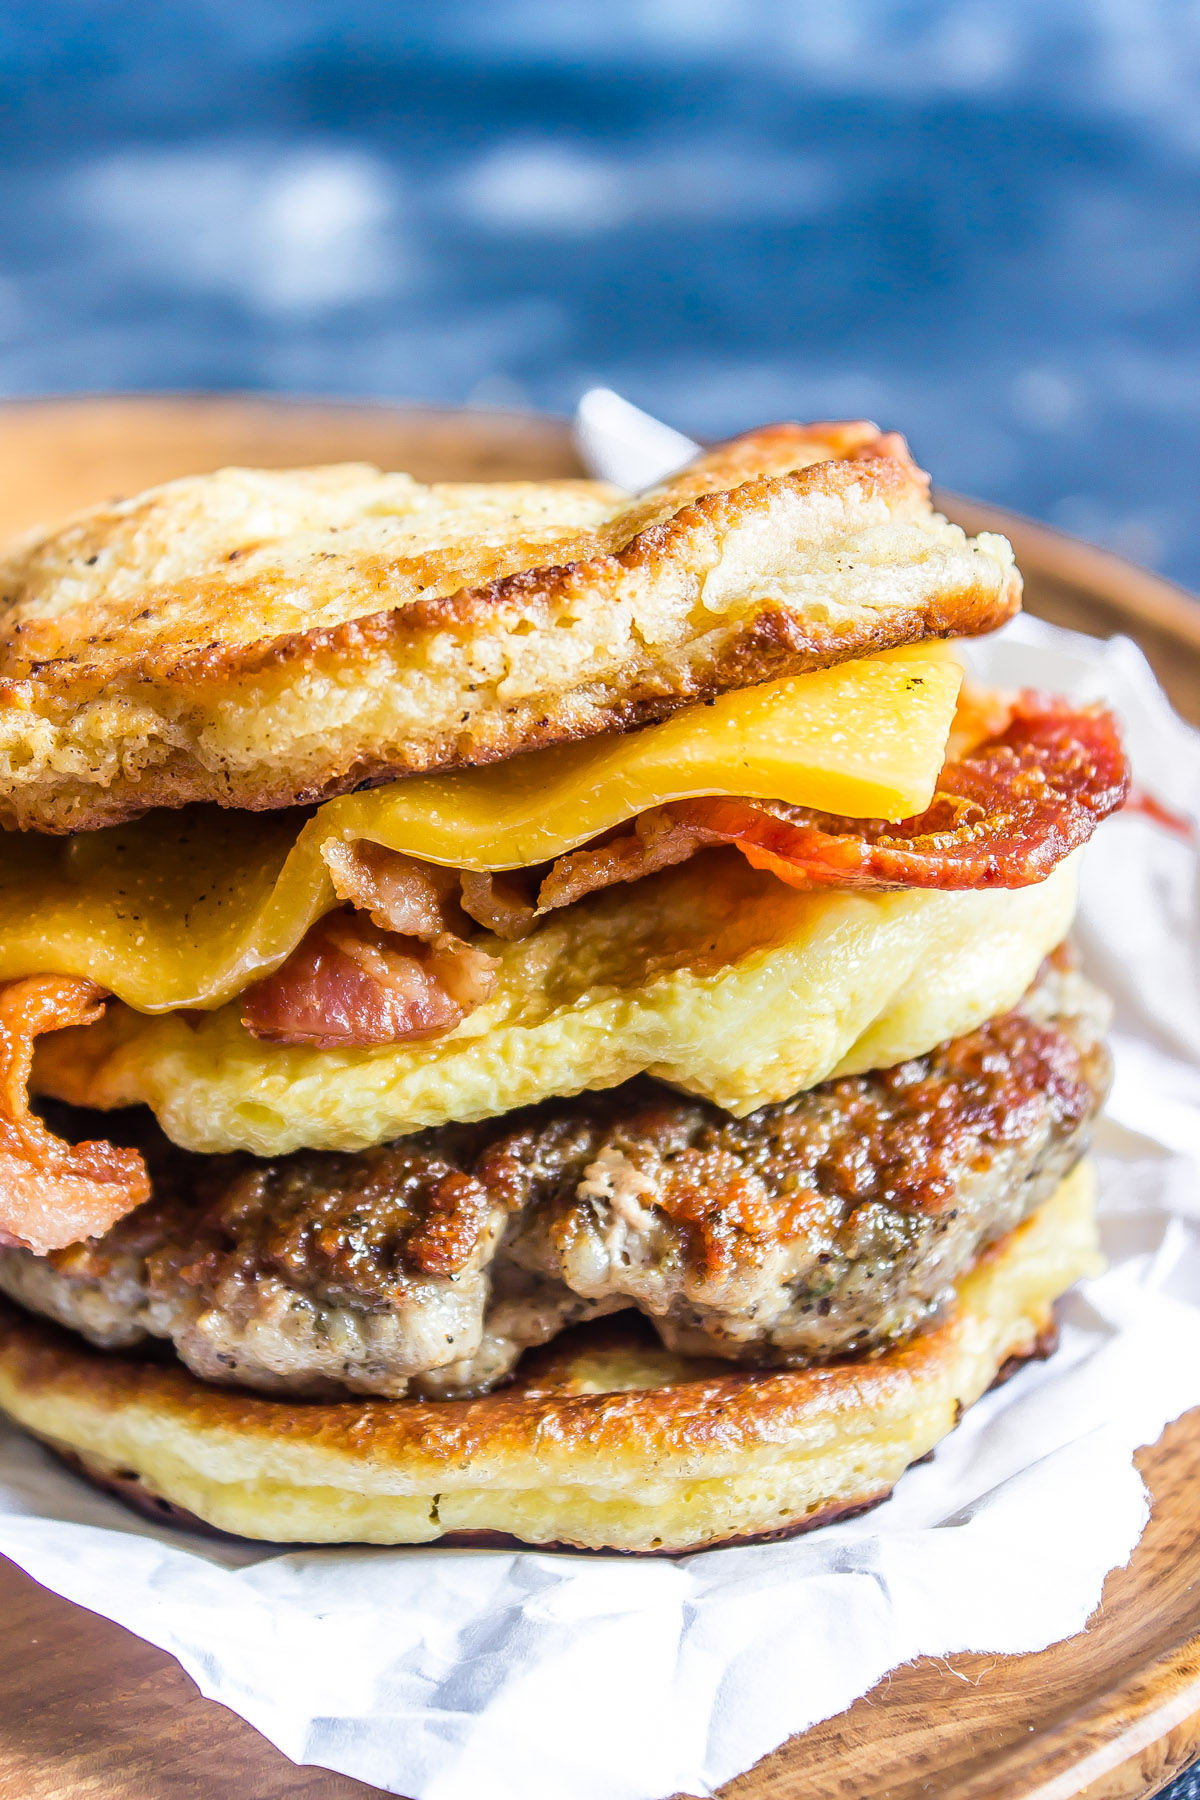 Keto Breakfast Sandwich (AKA Copycat Keto McGriddle) close up